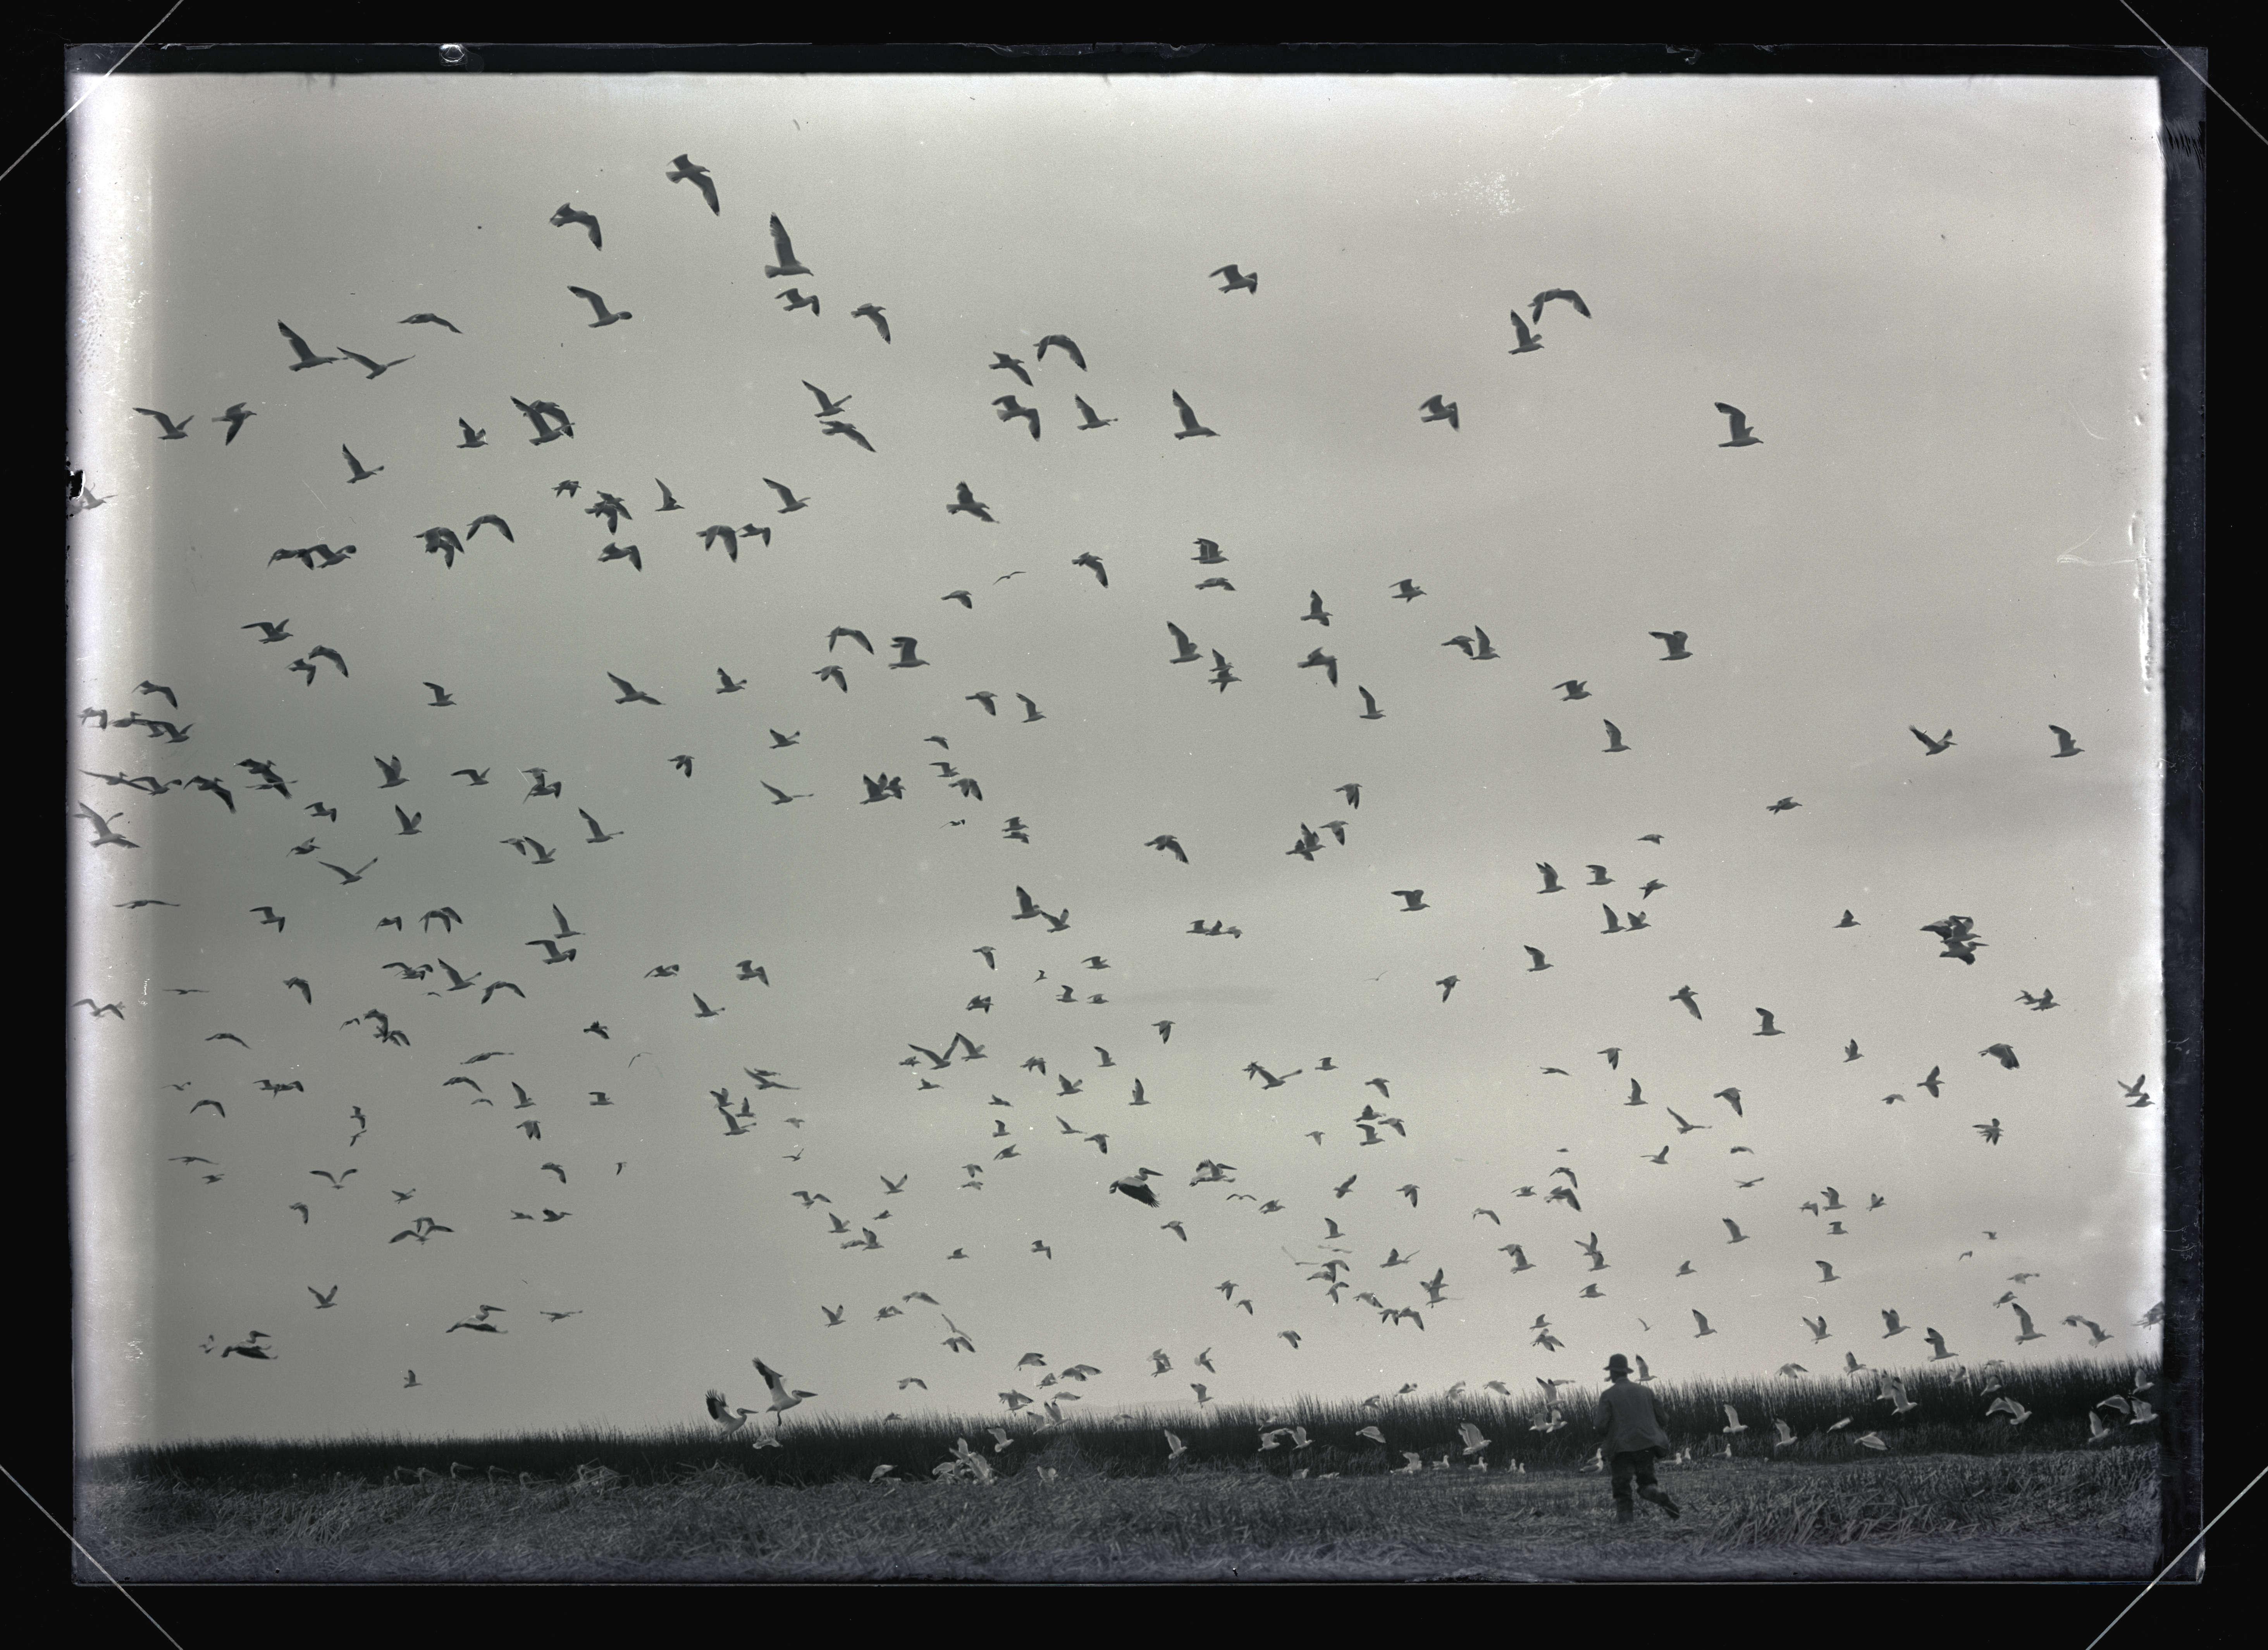 H. T. Bohlman Scaring Gulls